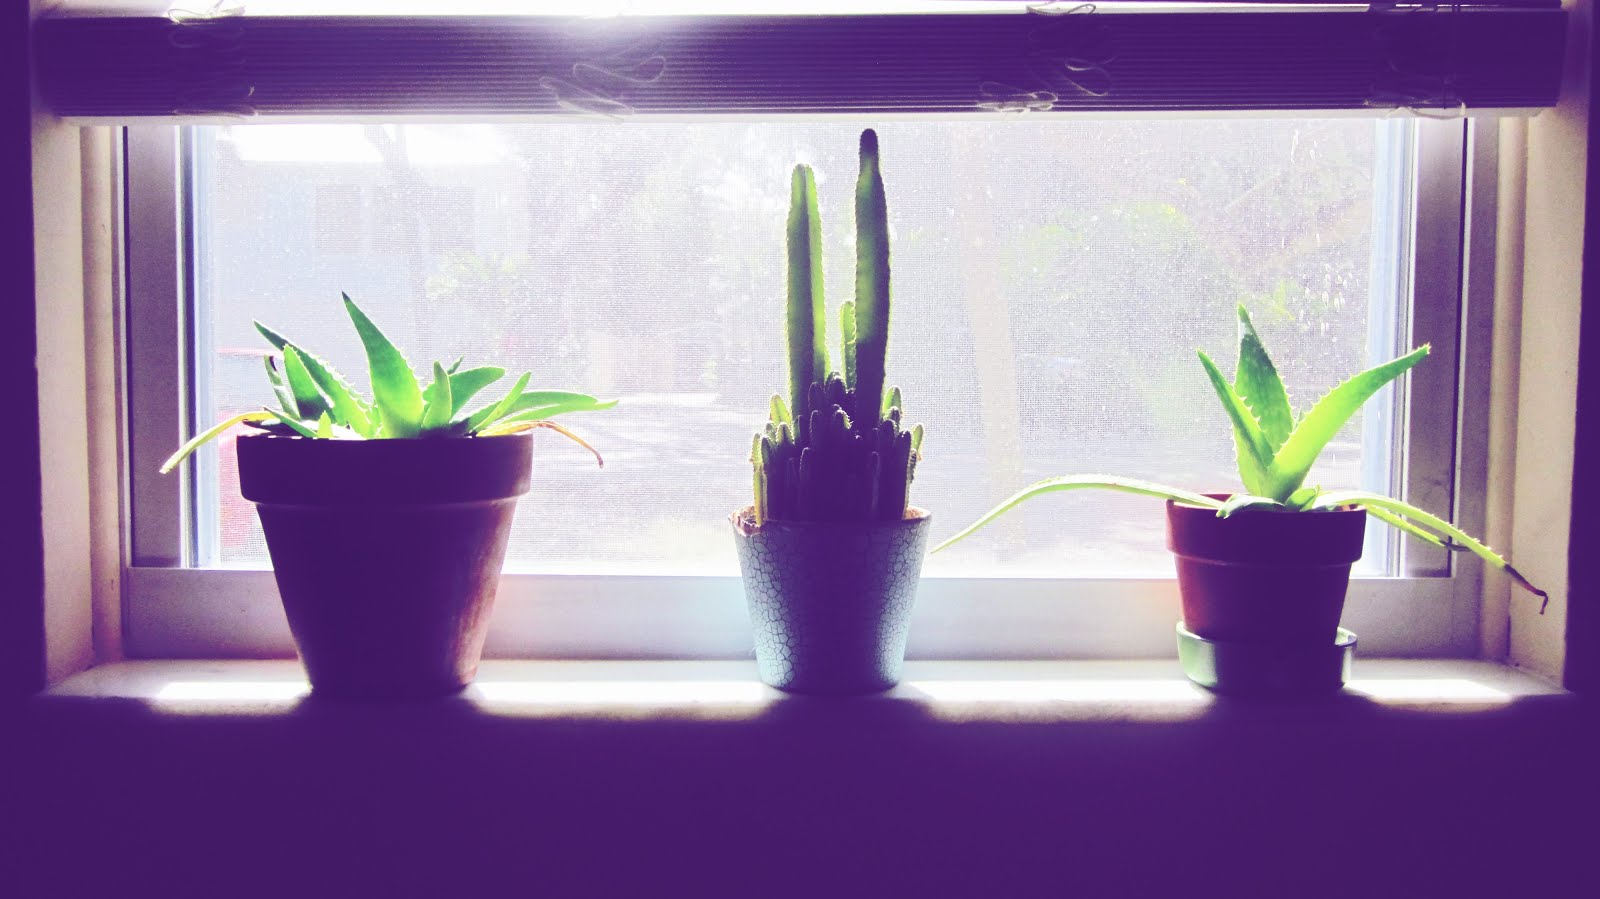 Windowsill Garden With Houseplants + Urban Planning